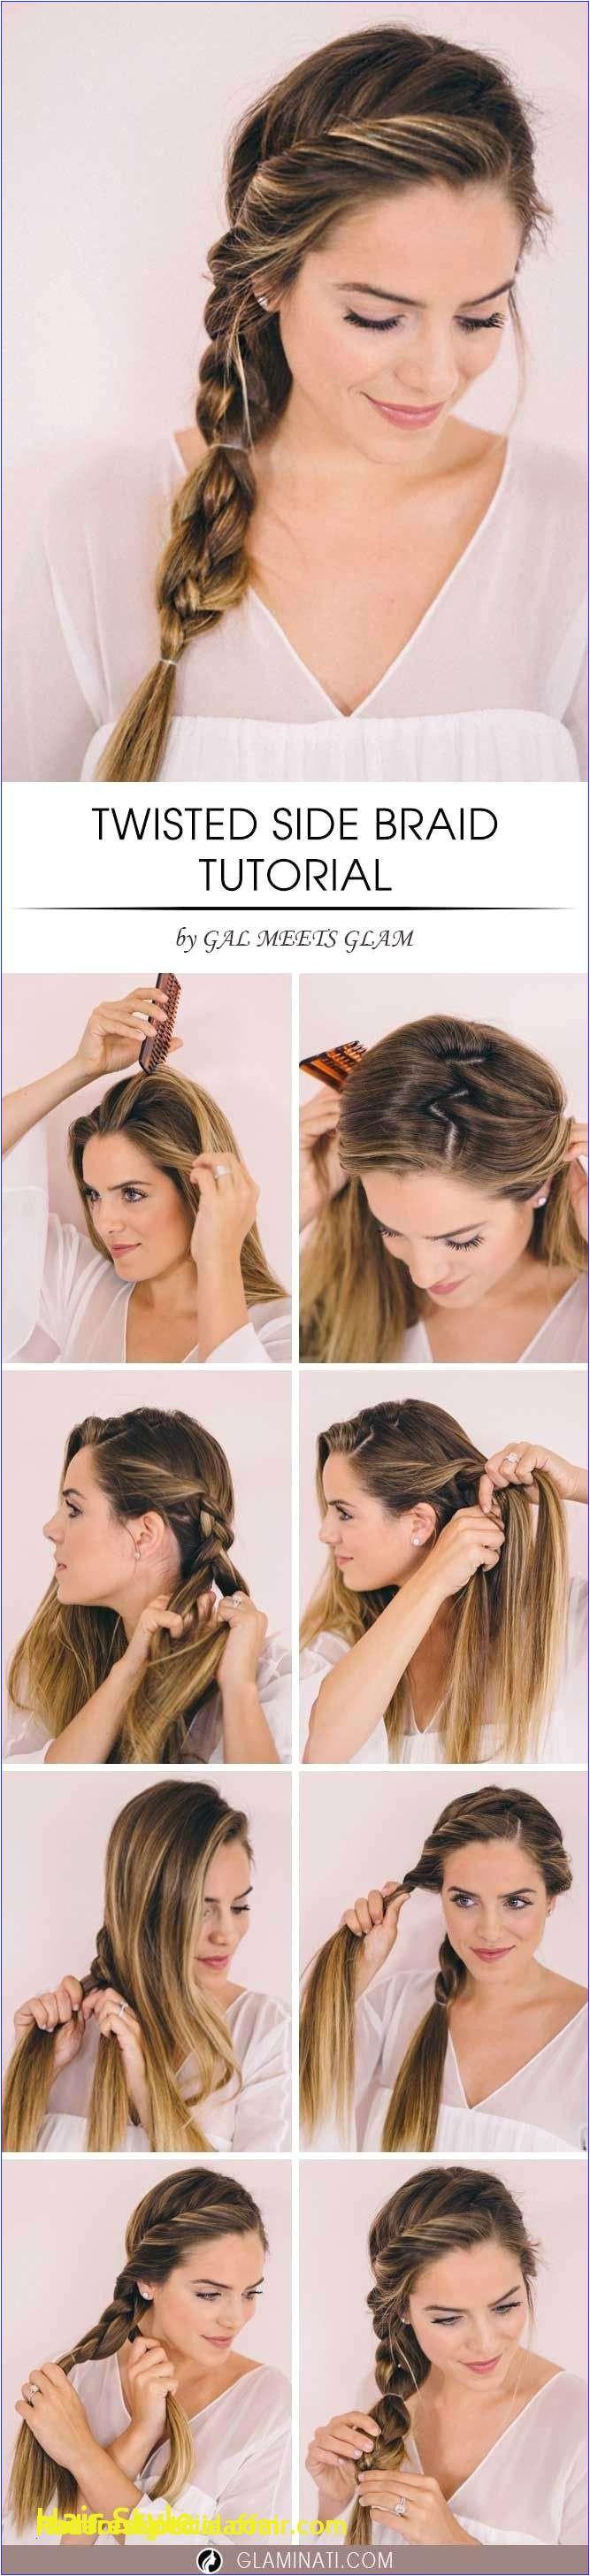 Cute Easy Hairstyles with Braids 7 Best Cute Easy Braided Hairstyles